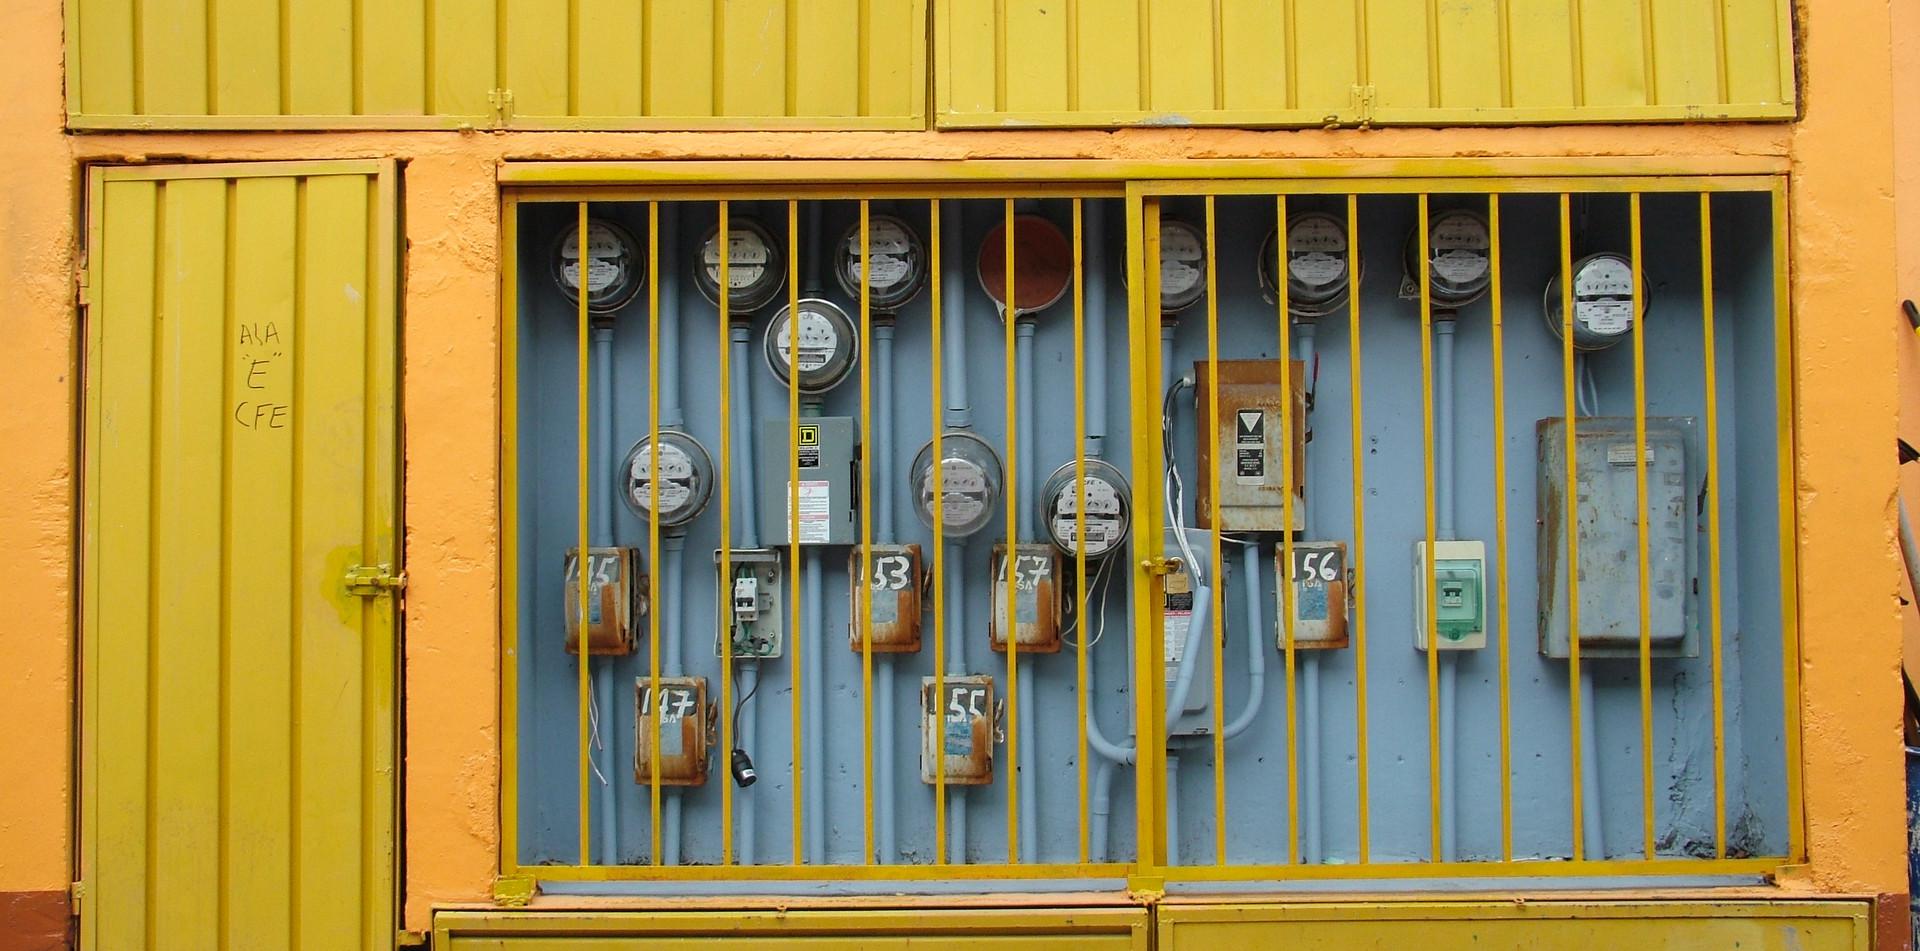 Locked electricity